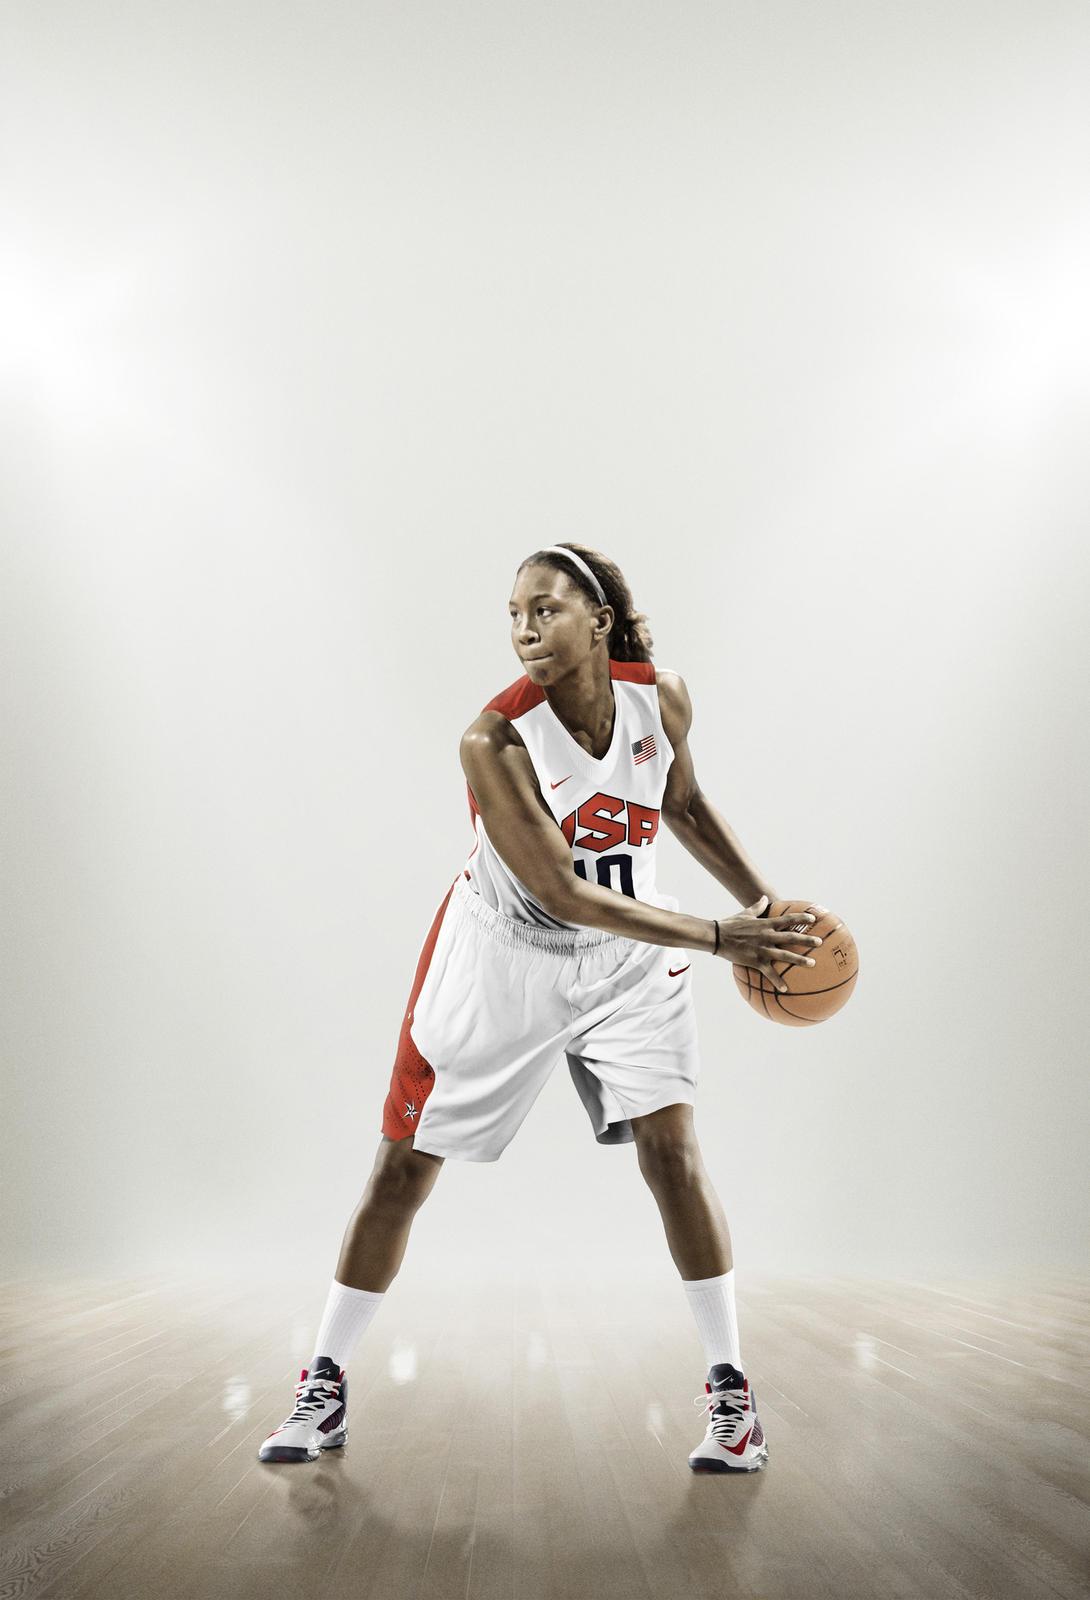 Girl Soccer Player Wallpaper Nike Unveils Basketball Hyper Elite Uniform And Nike